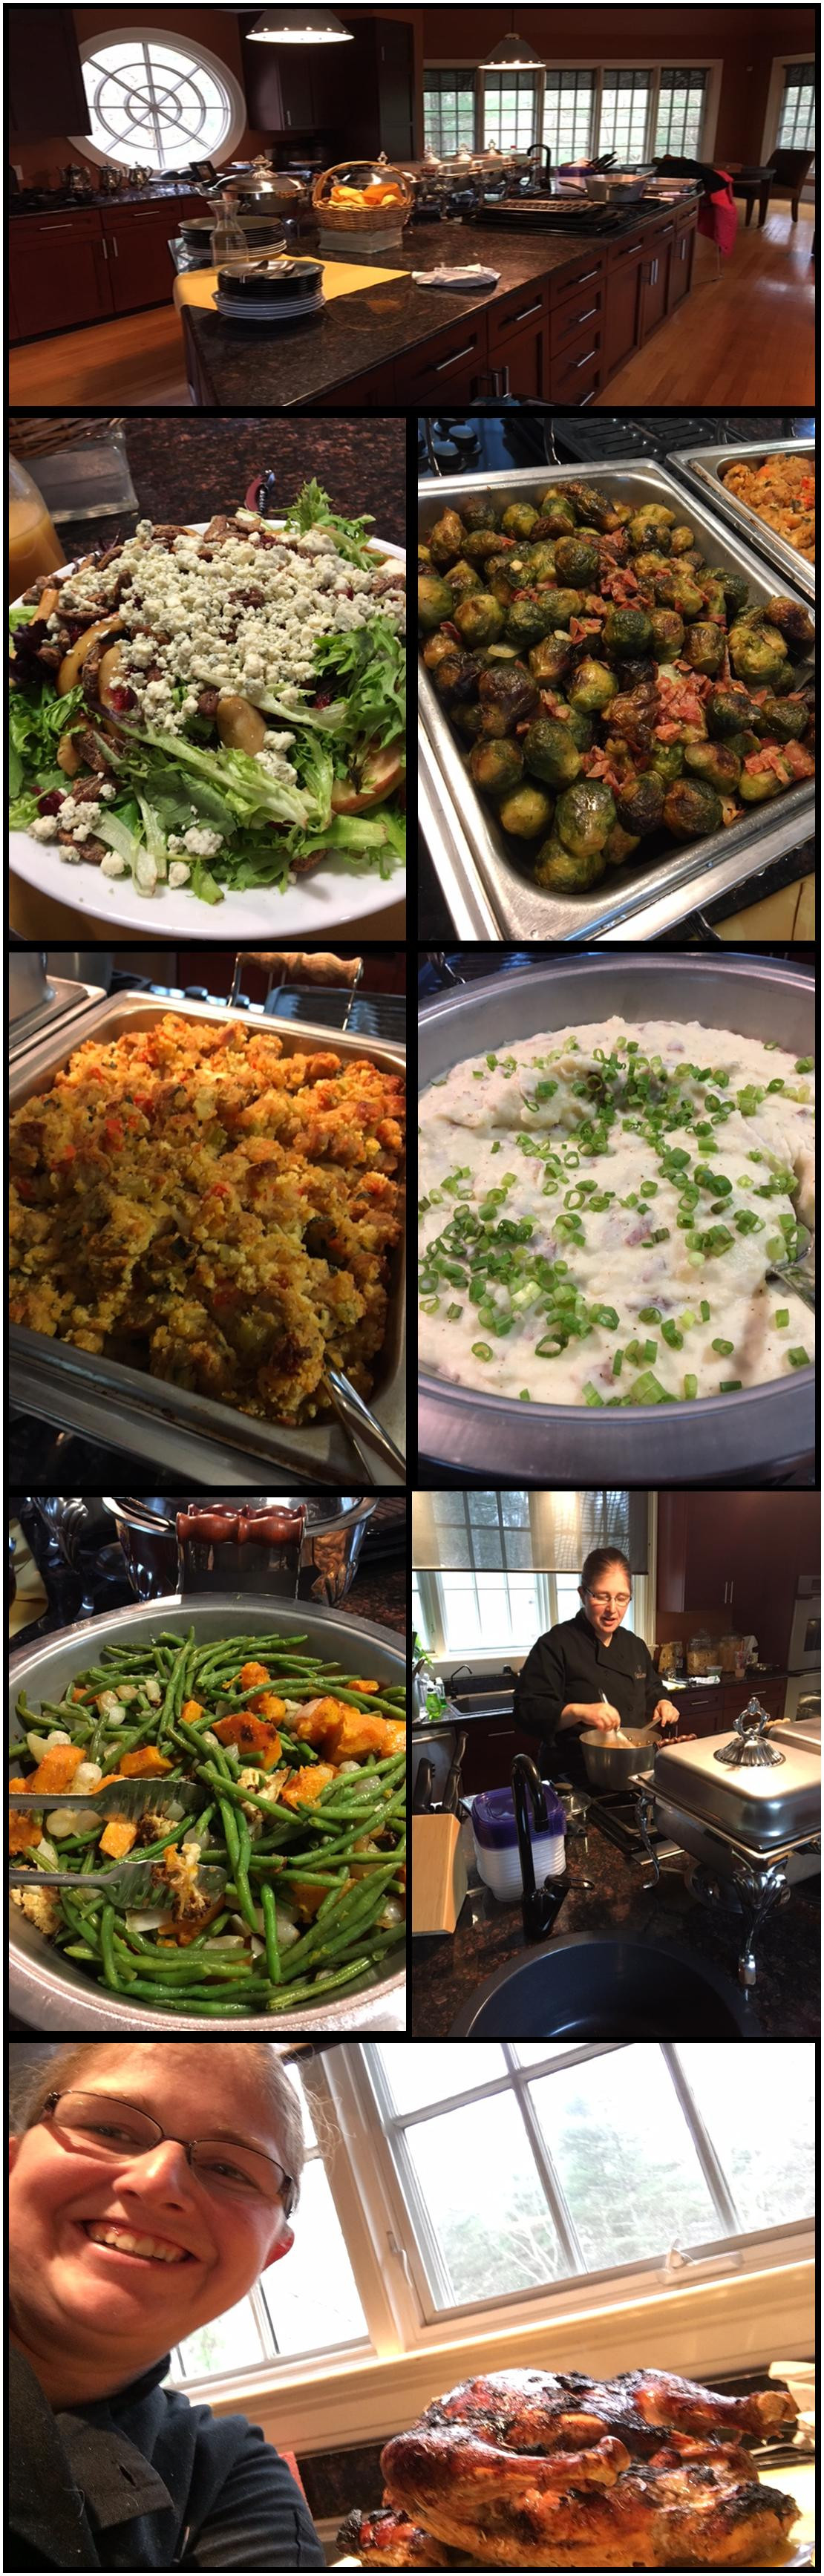 Cater Thanksgiving Dinner  Catering Thanksgiving Dinner North Smithfield RI 2016